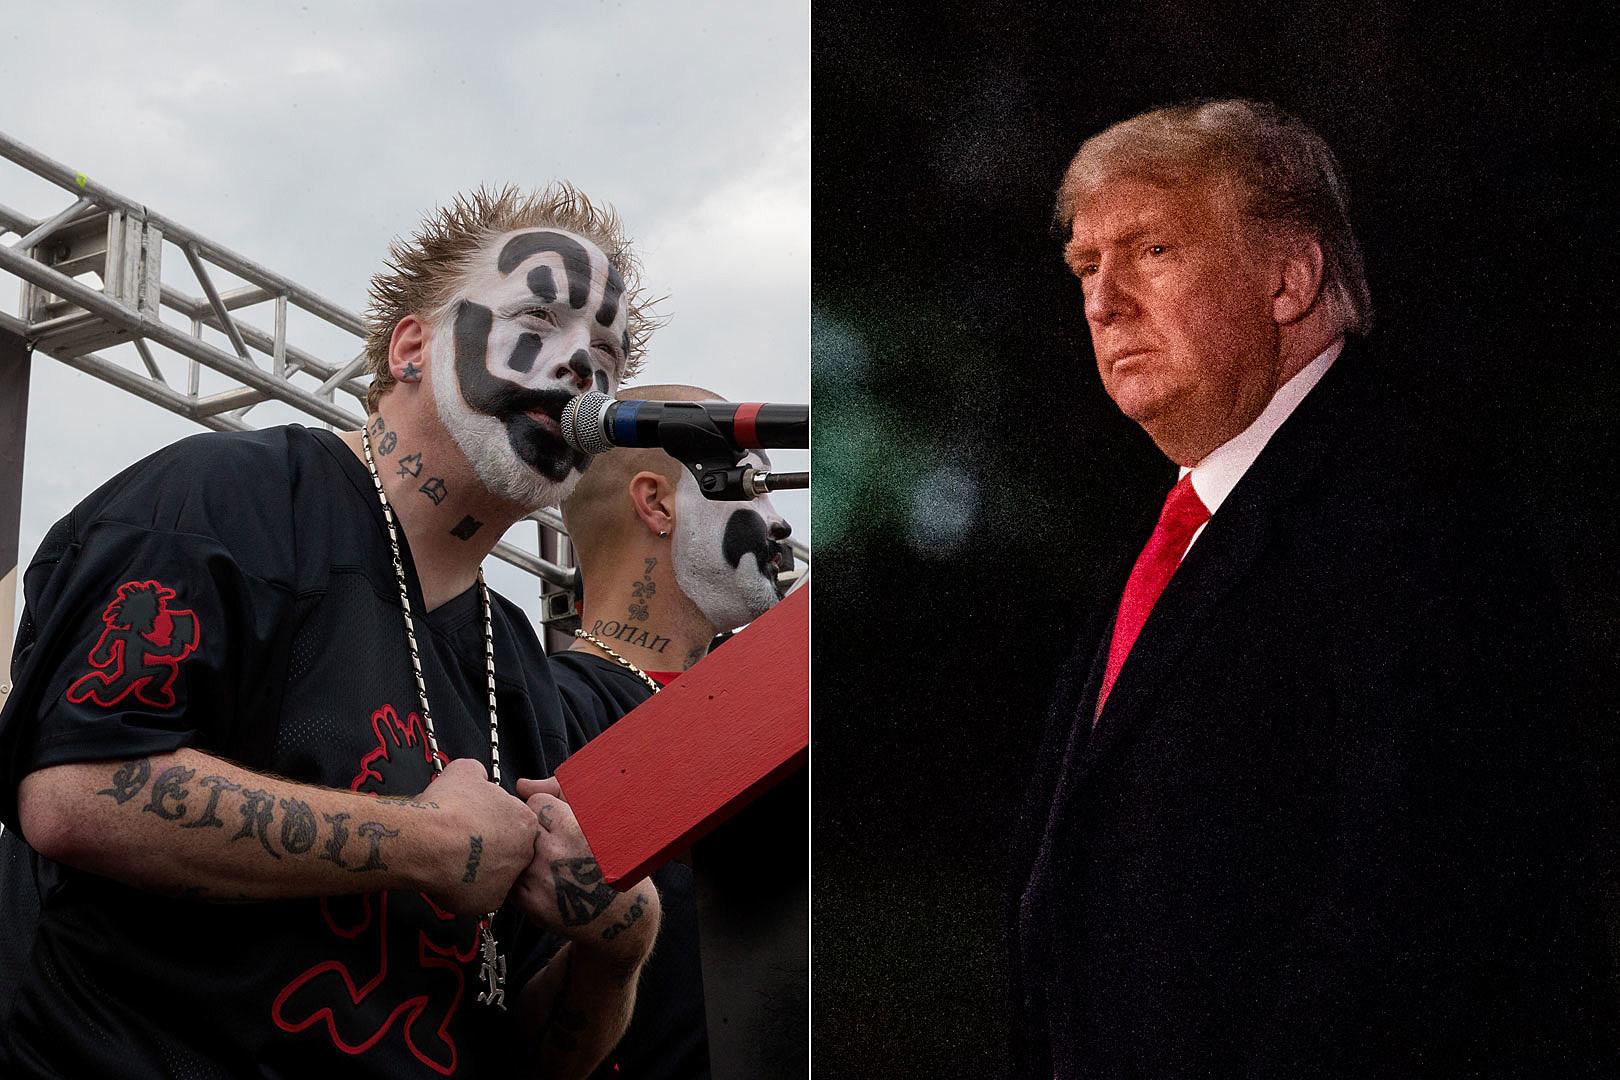 ICP's Violent J Blasts Media for Comparing 'Trumpist' to Juggalos